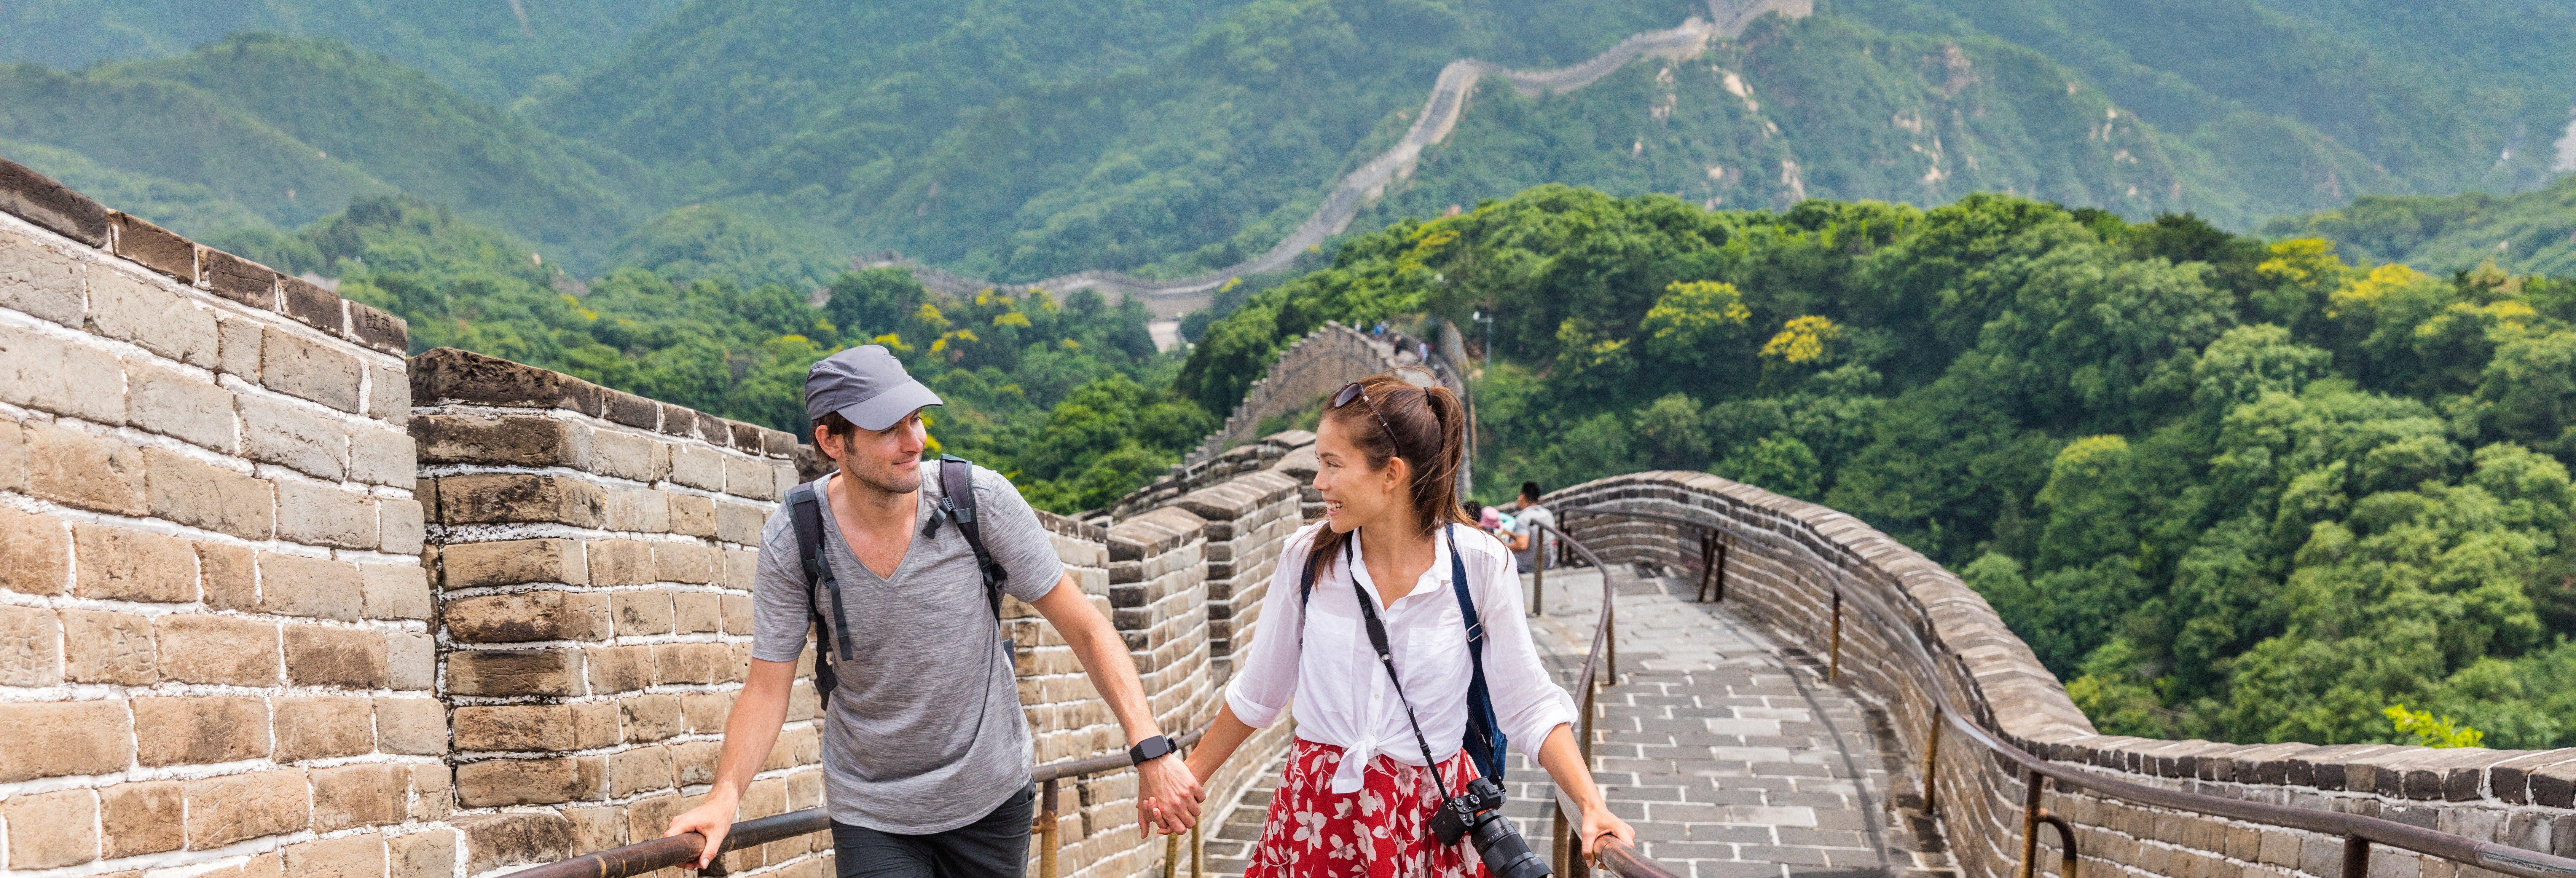 Beijing & Shanghai Tour Package: 7 Days